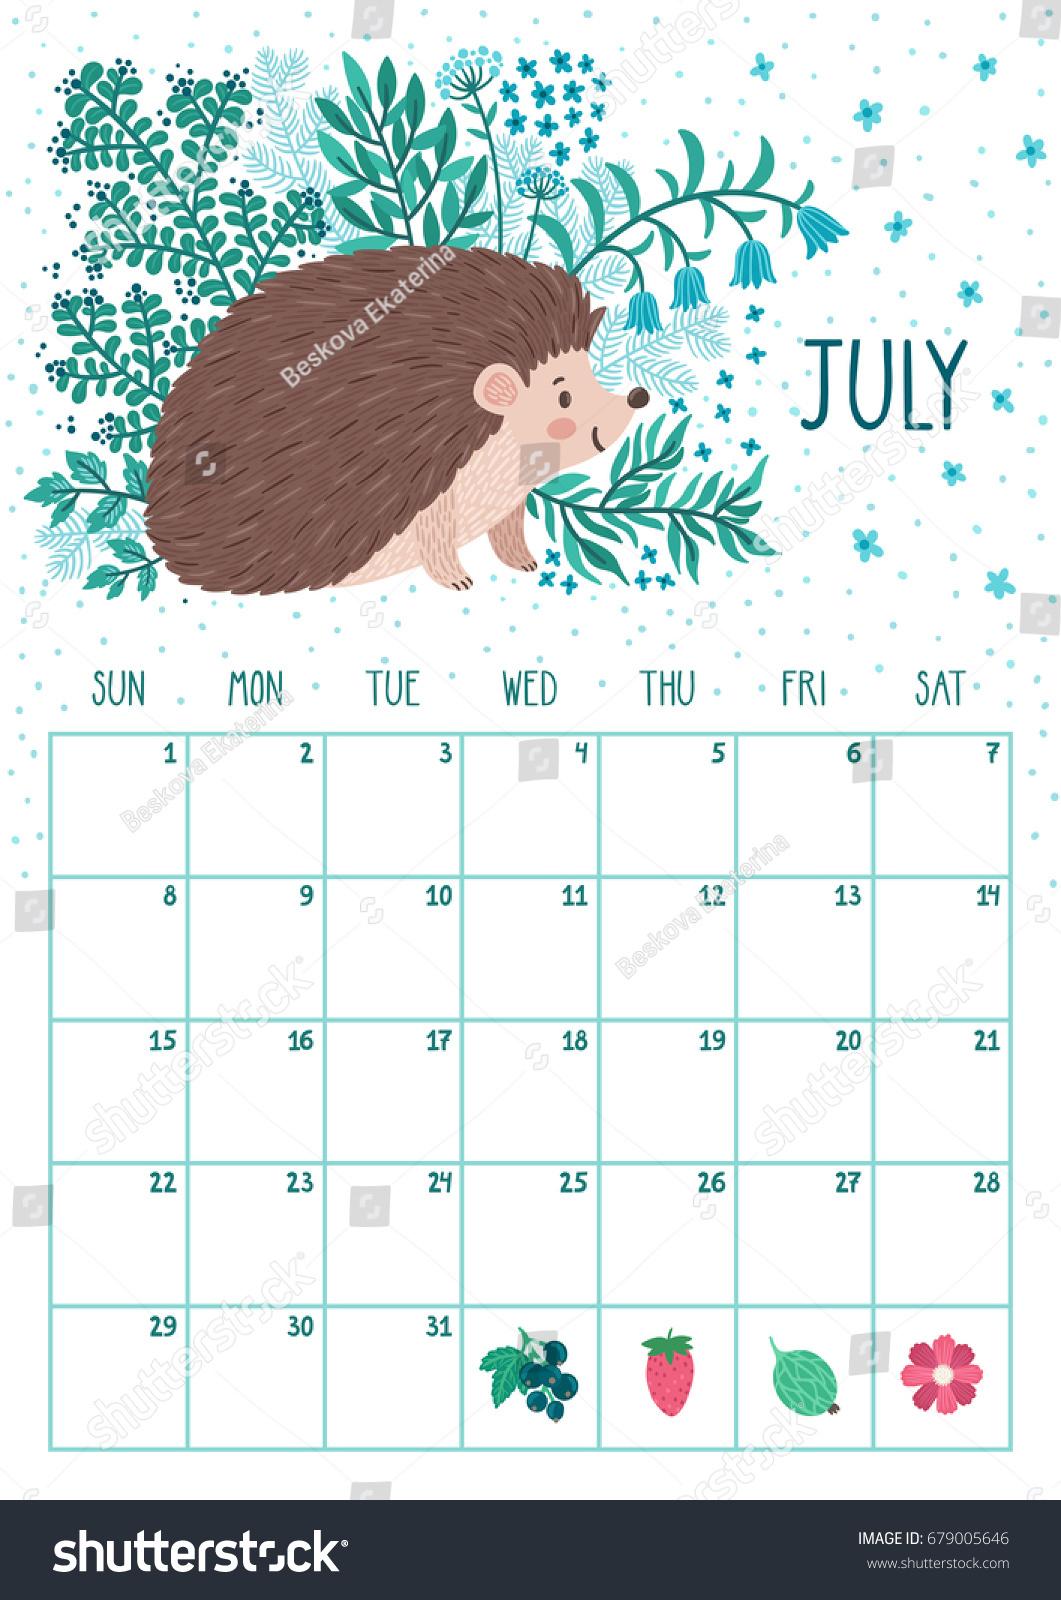 Vector Monthly Calendar Cute Hedgehog July Stock Vector 679005646